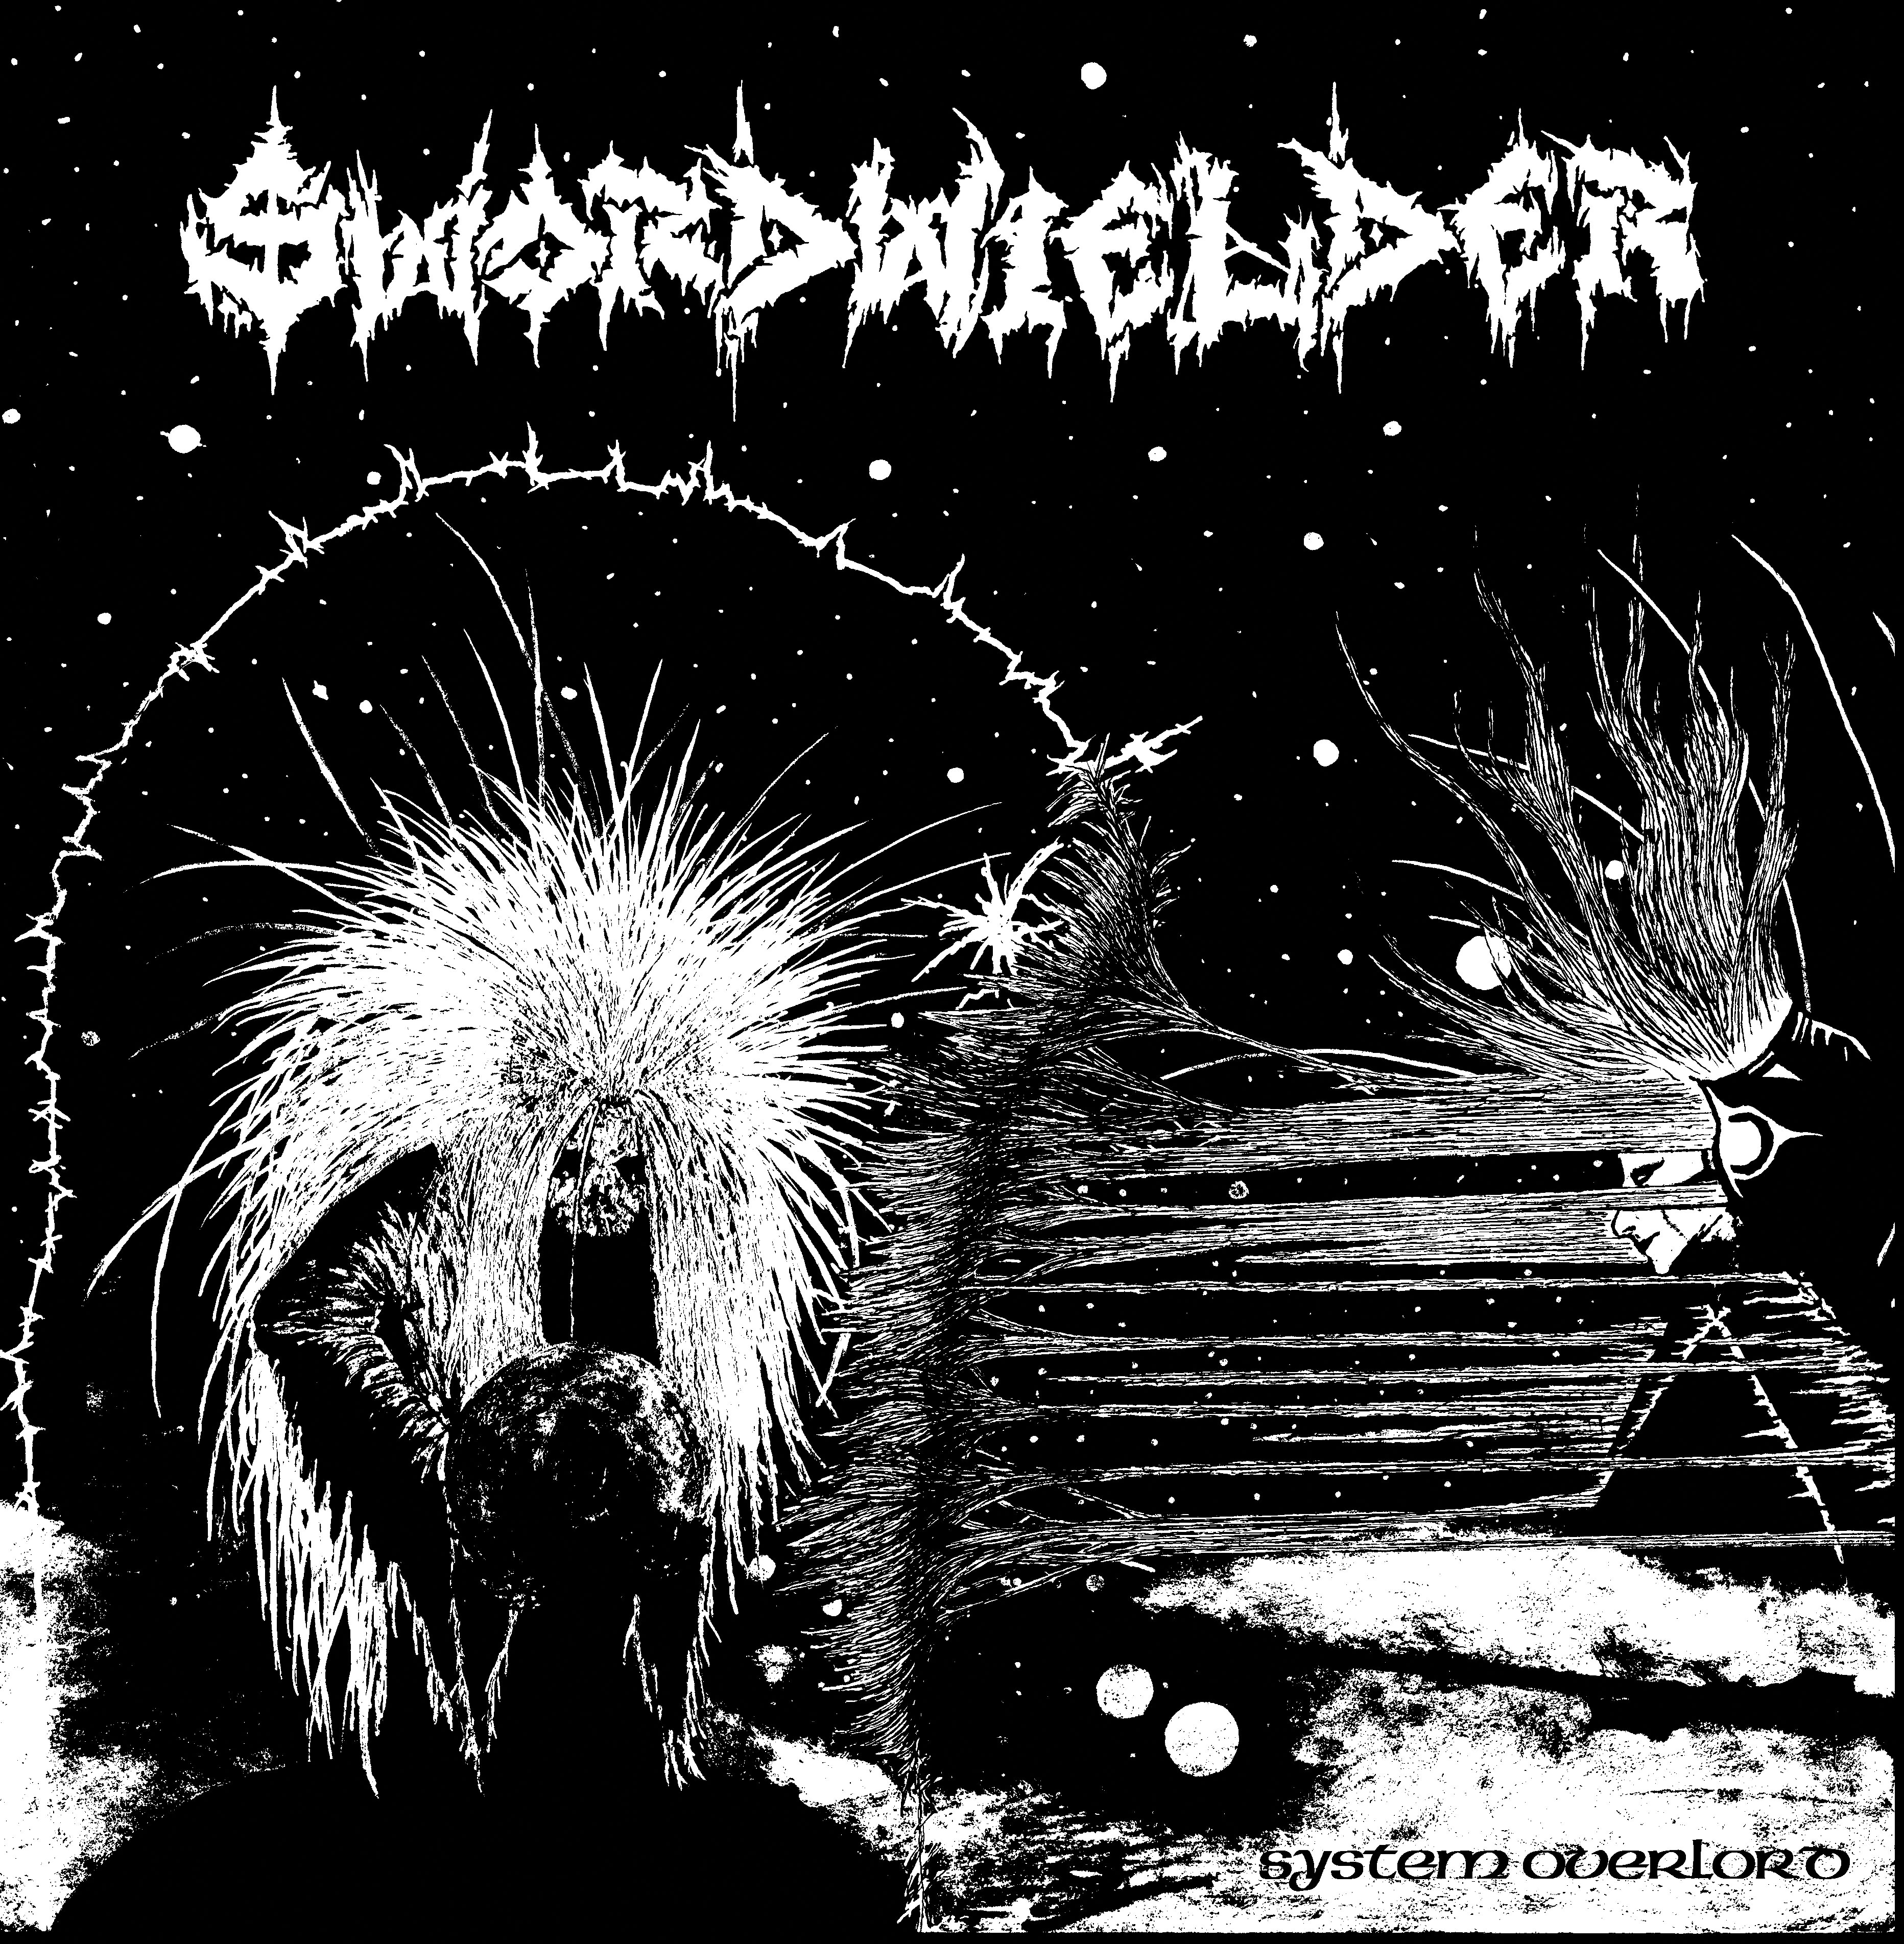 Swordwielder - Grim Visions Of Battle -   Music